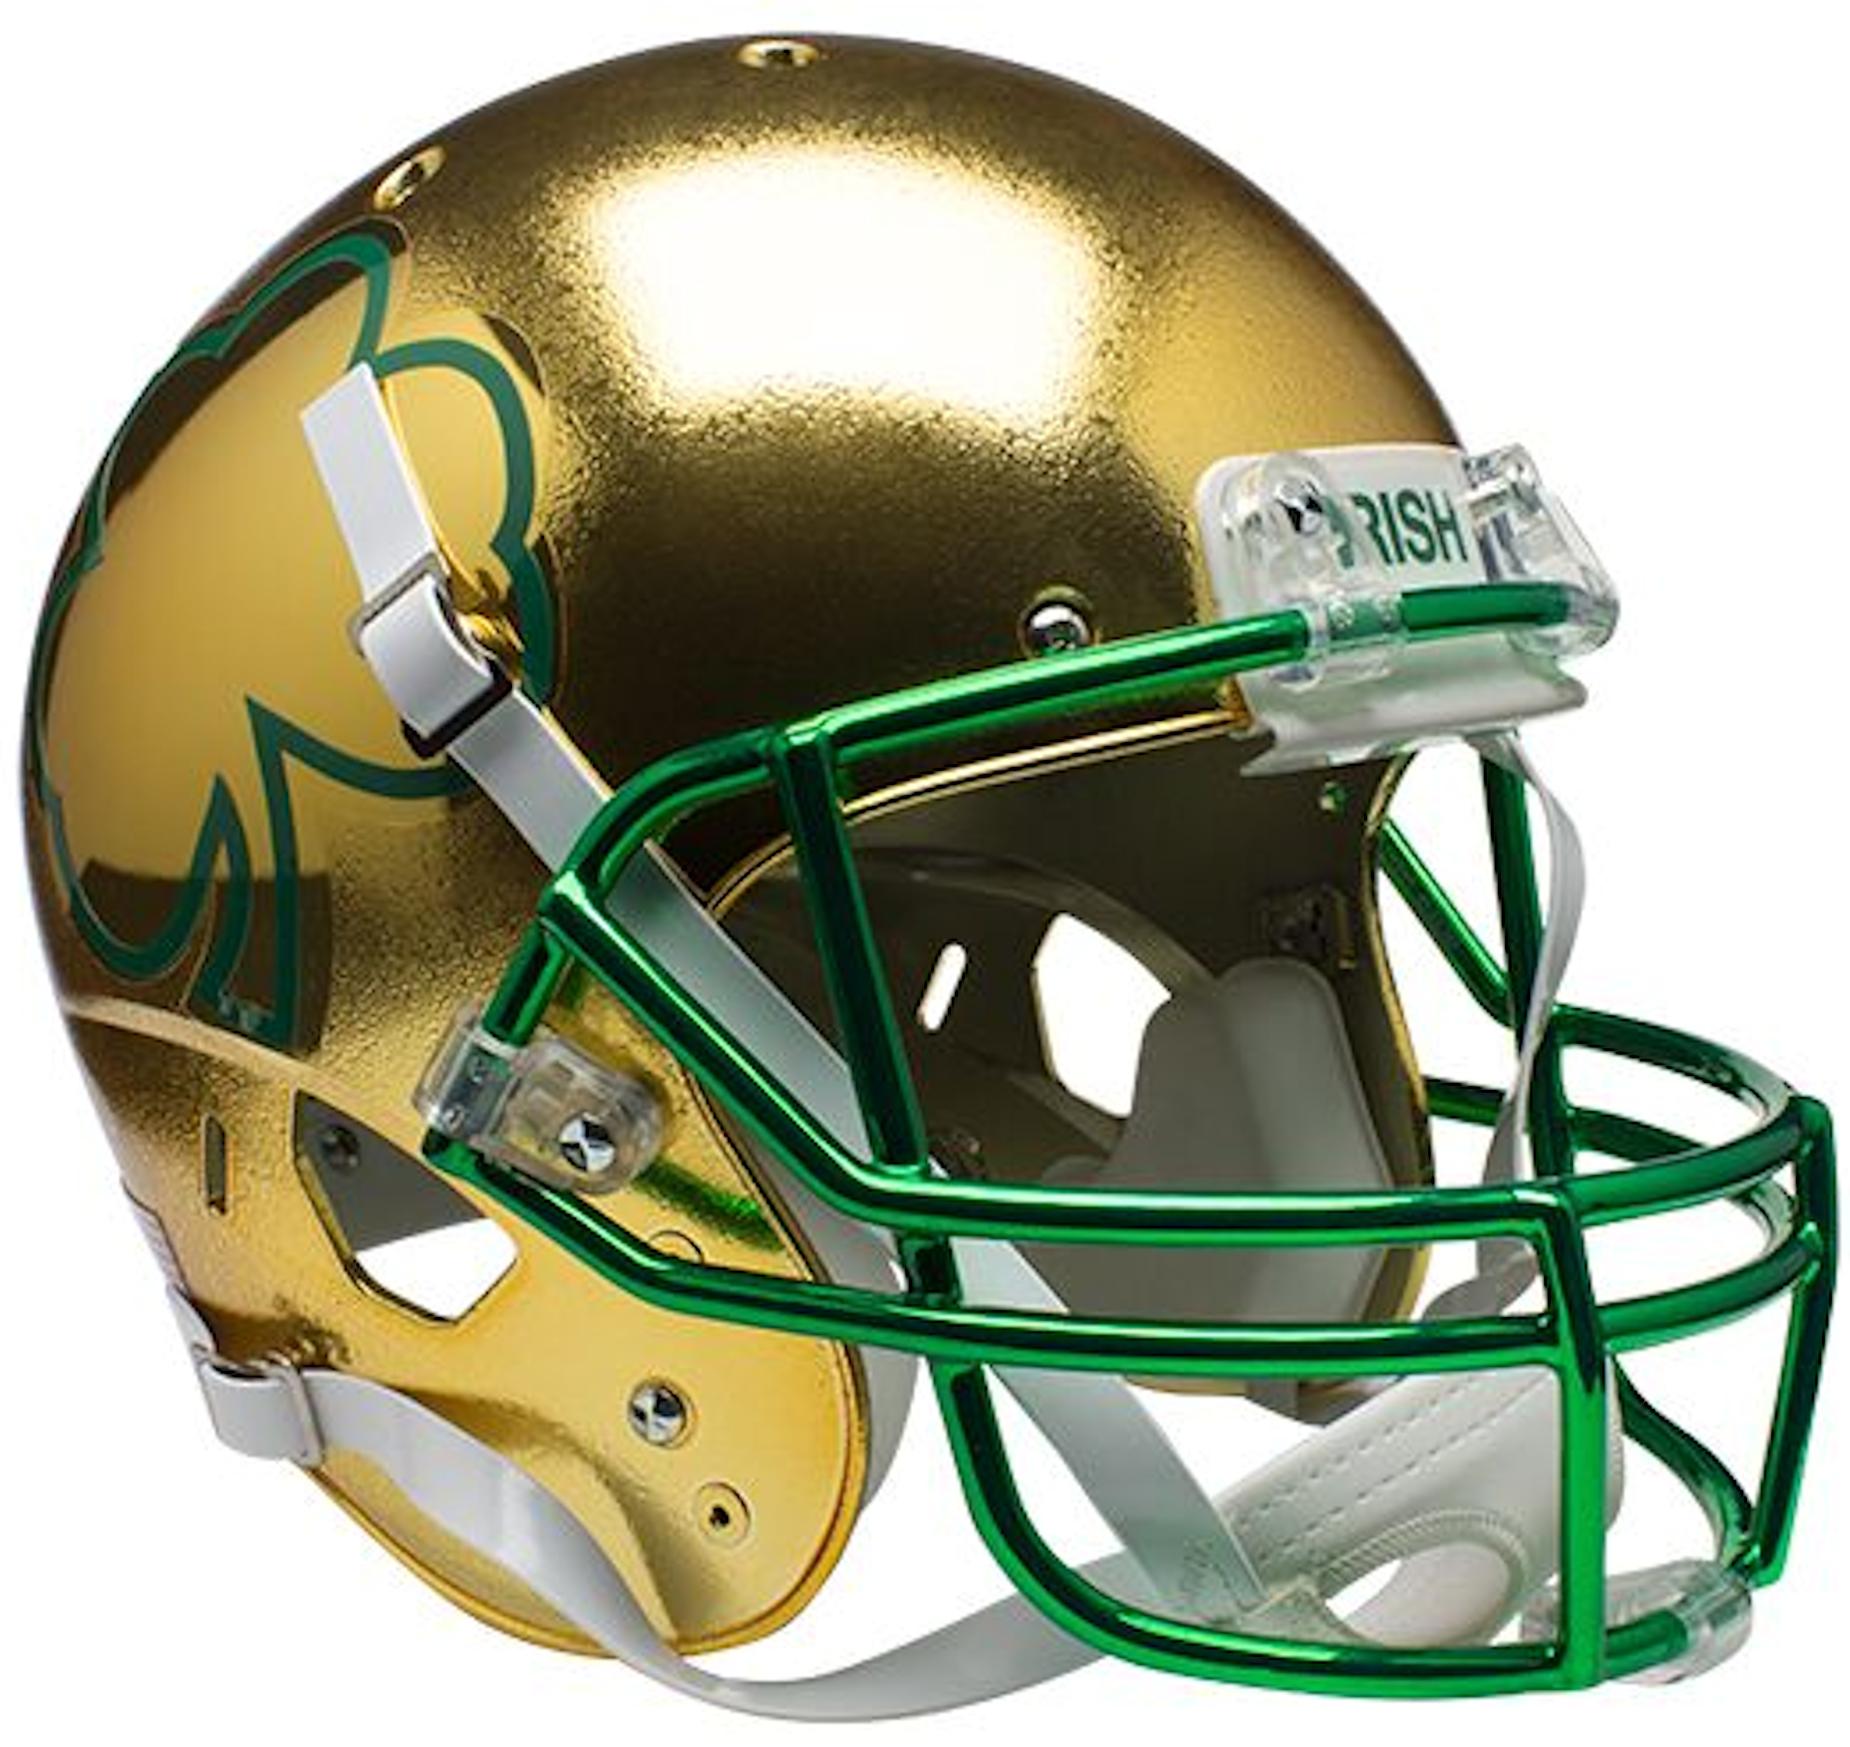 Notre Dame Fighting Irish Full XP Replica Football Helmet Schutt <B>Textured with Shamrock</B>